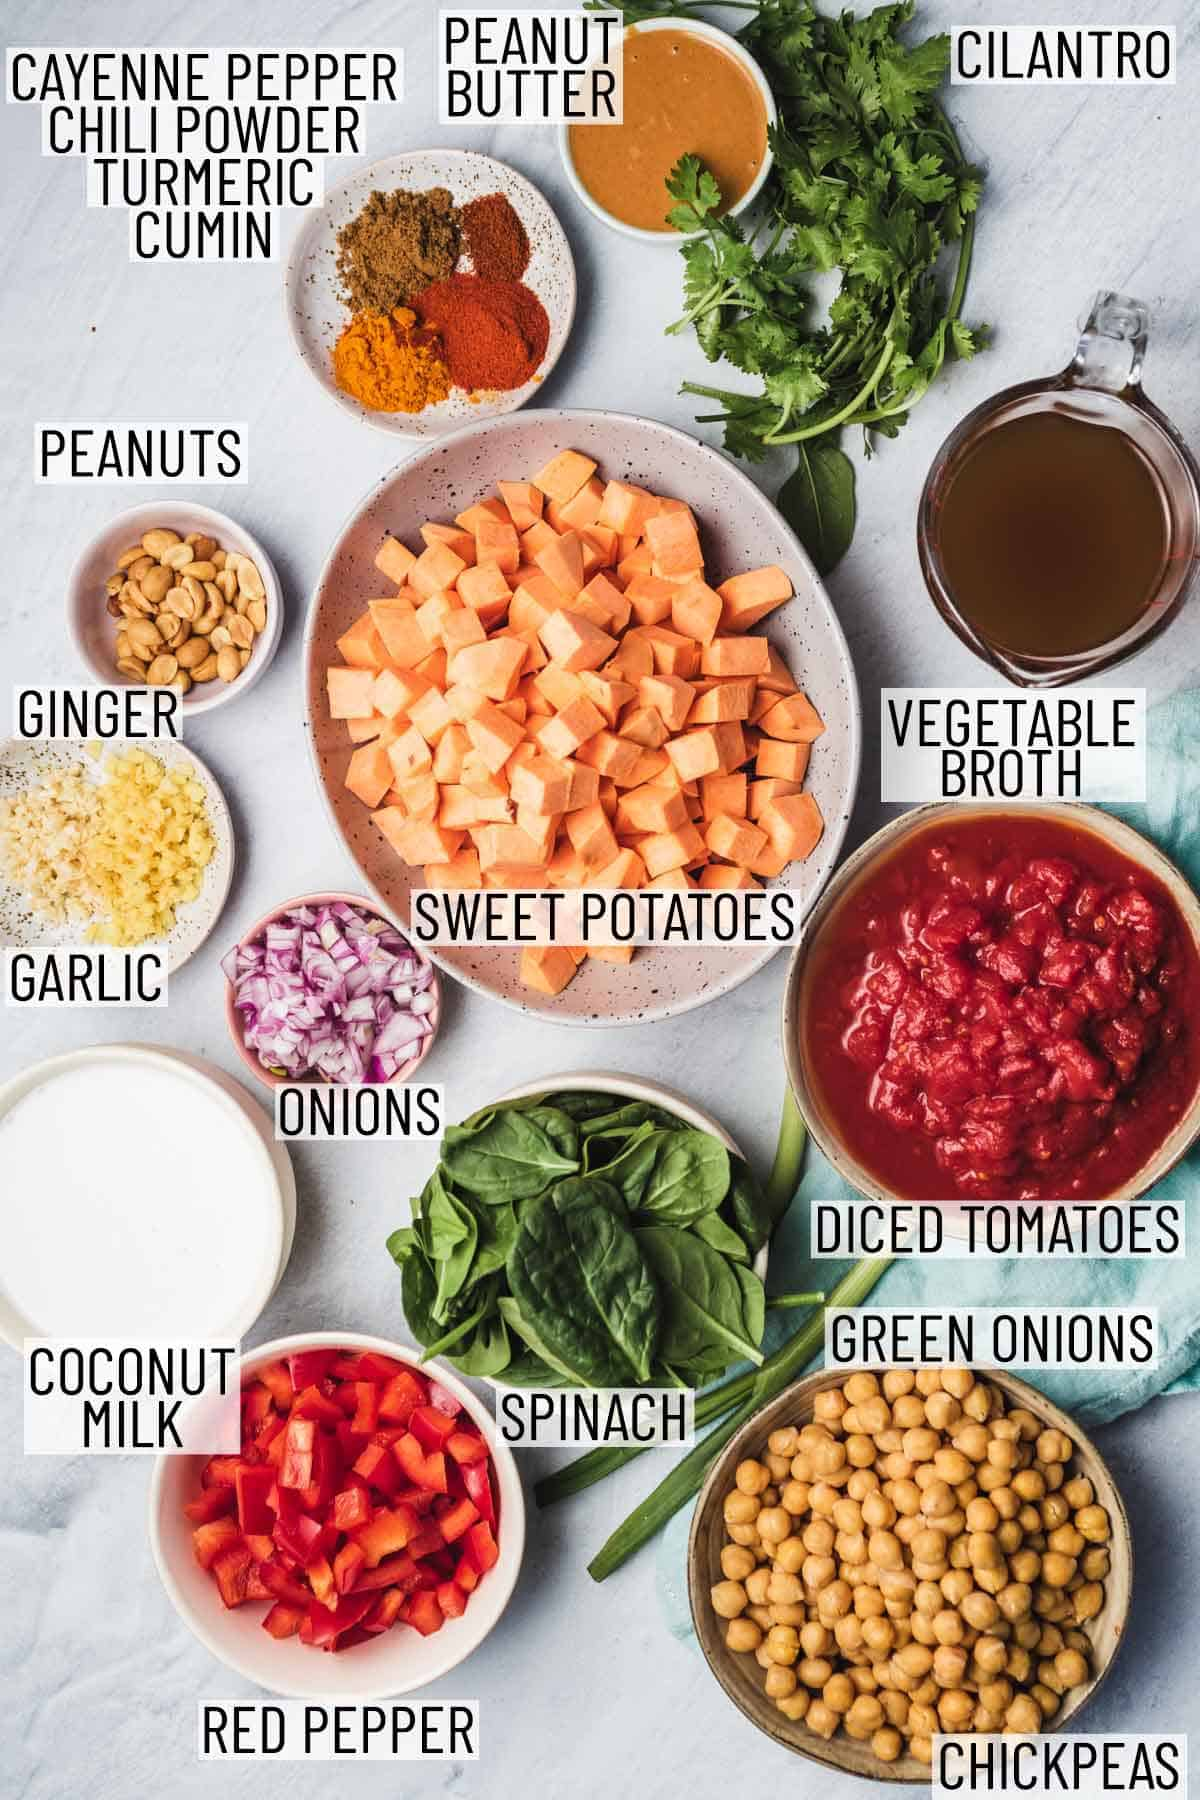 Ingredients needed to make sweet potato peanut soup.